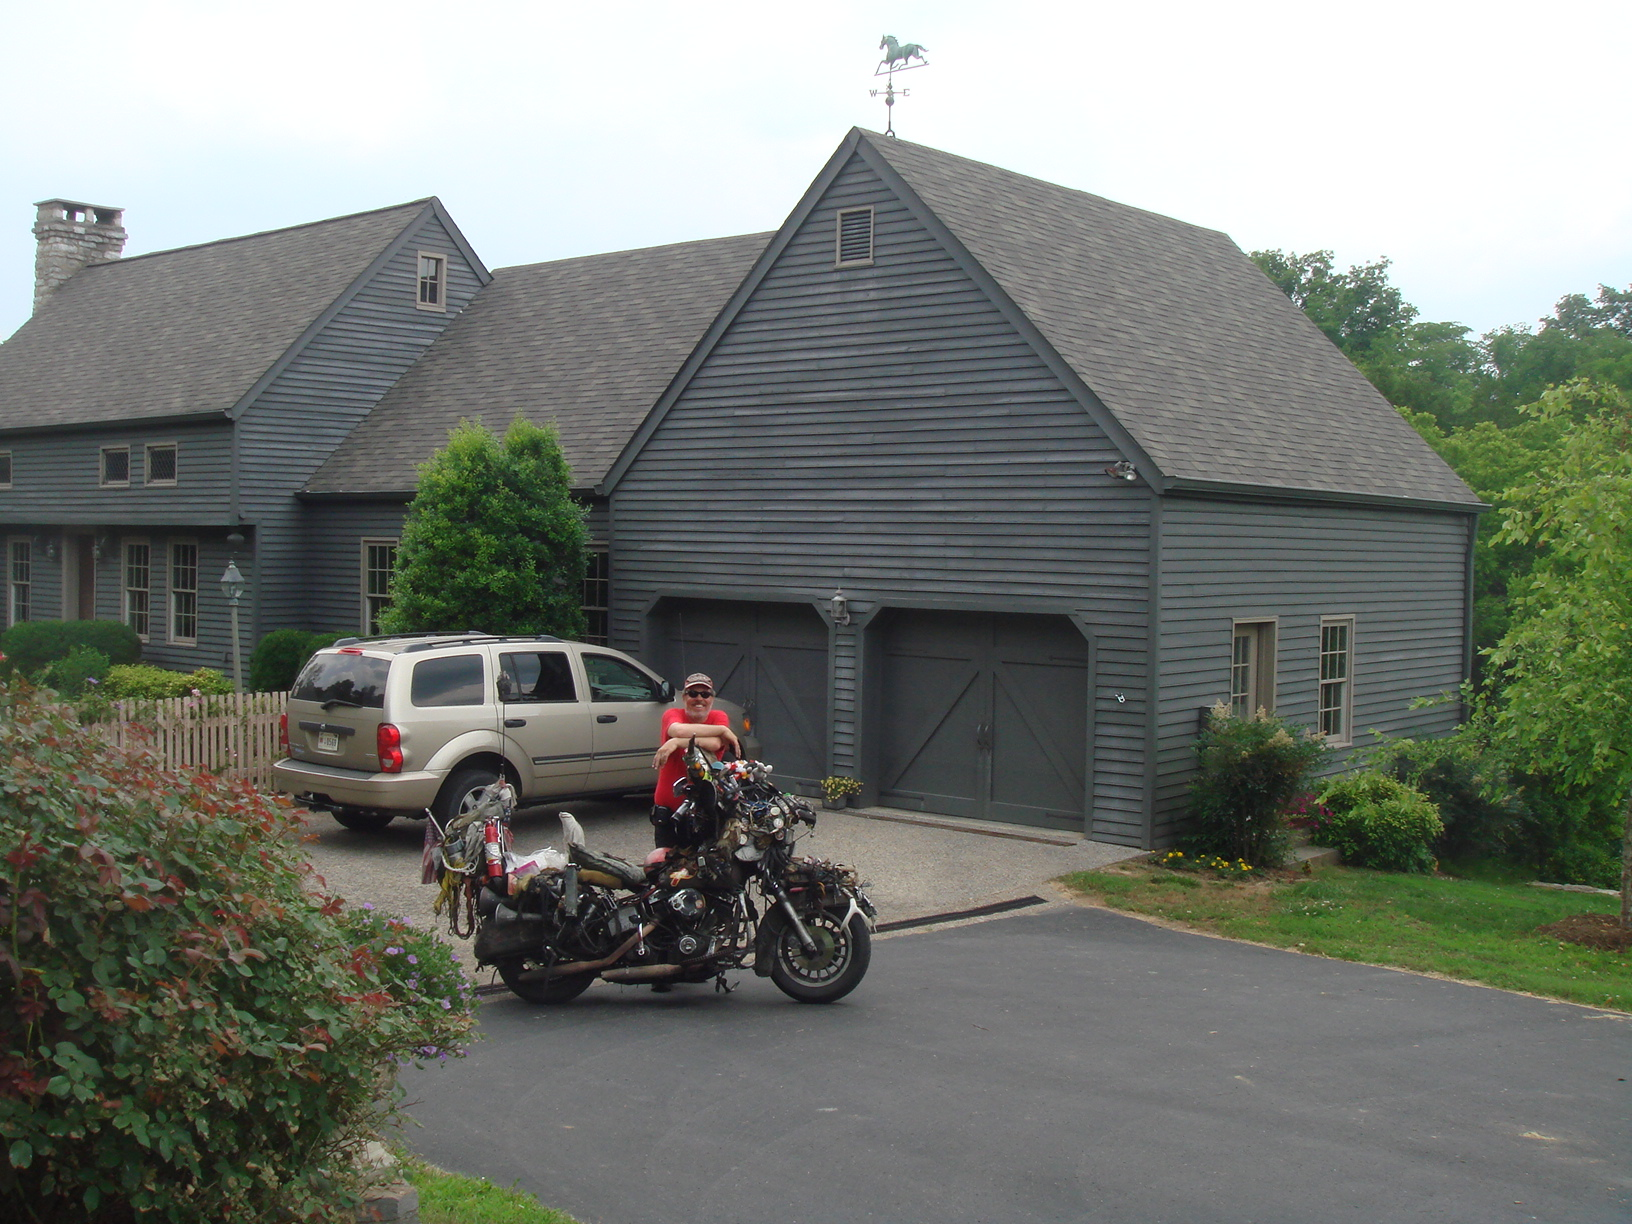 David & Jane's home